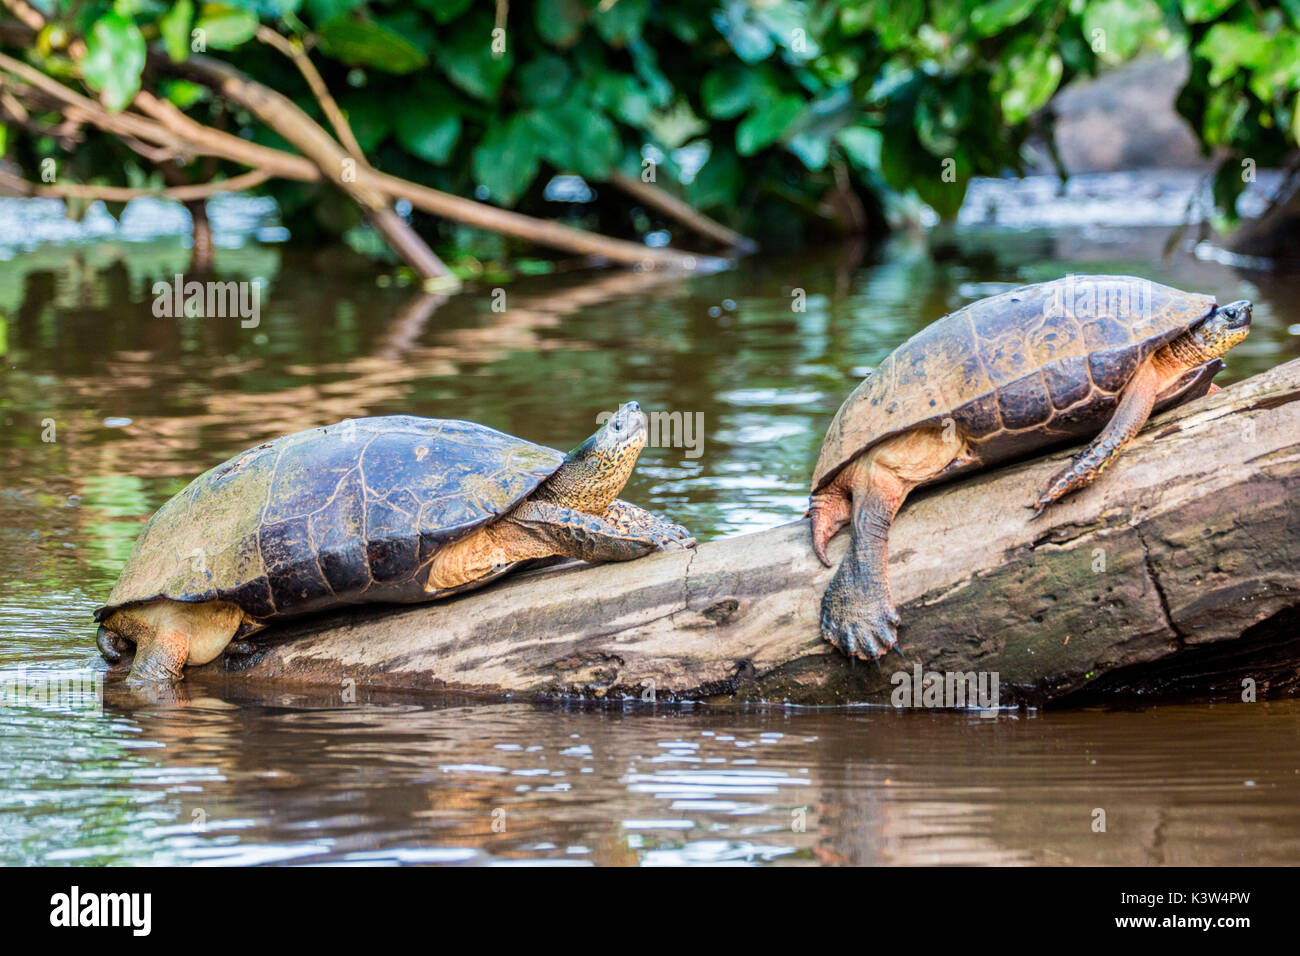 Tortuguero, Costa Rica, wild turtles on a - Stock Image